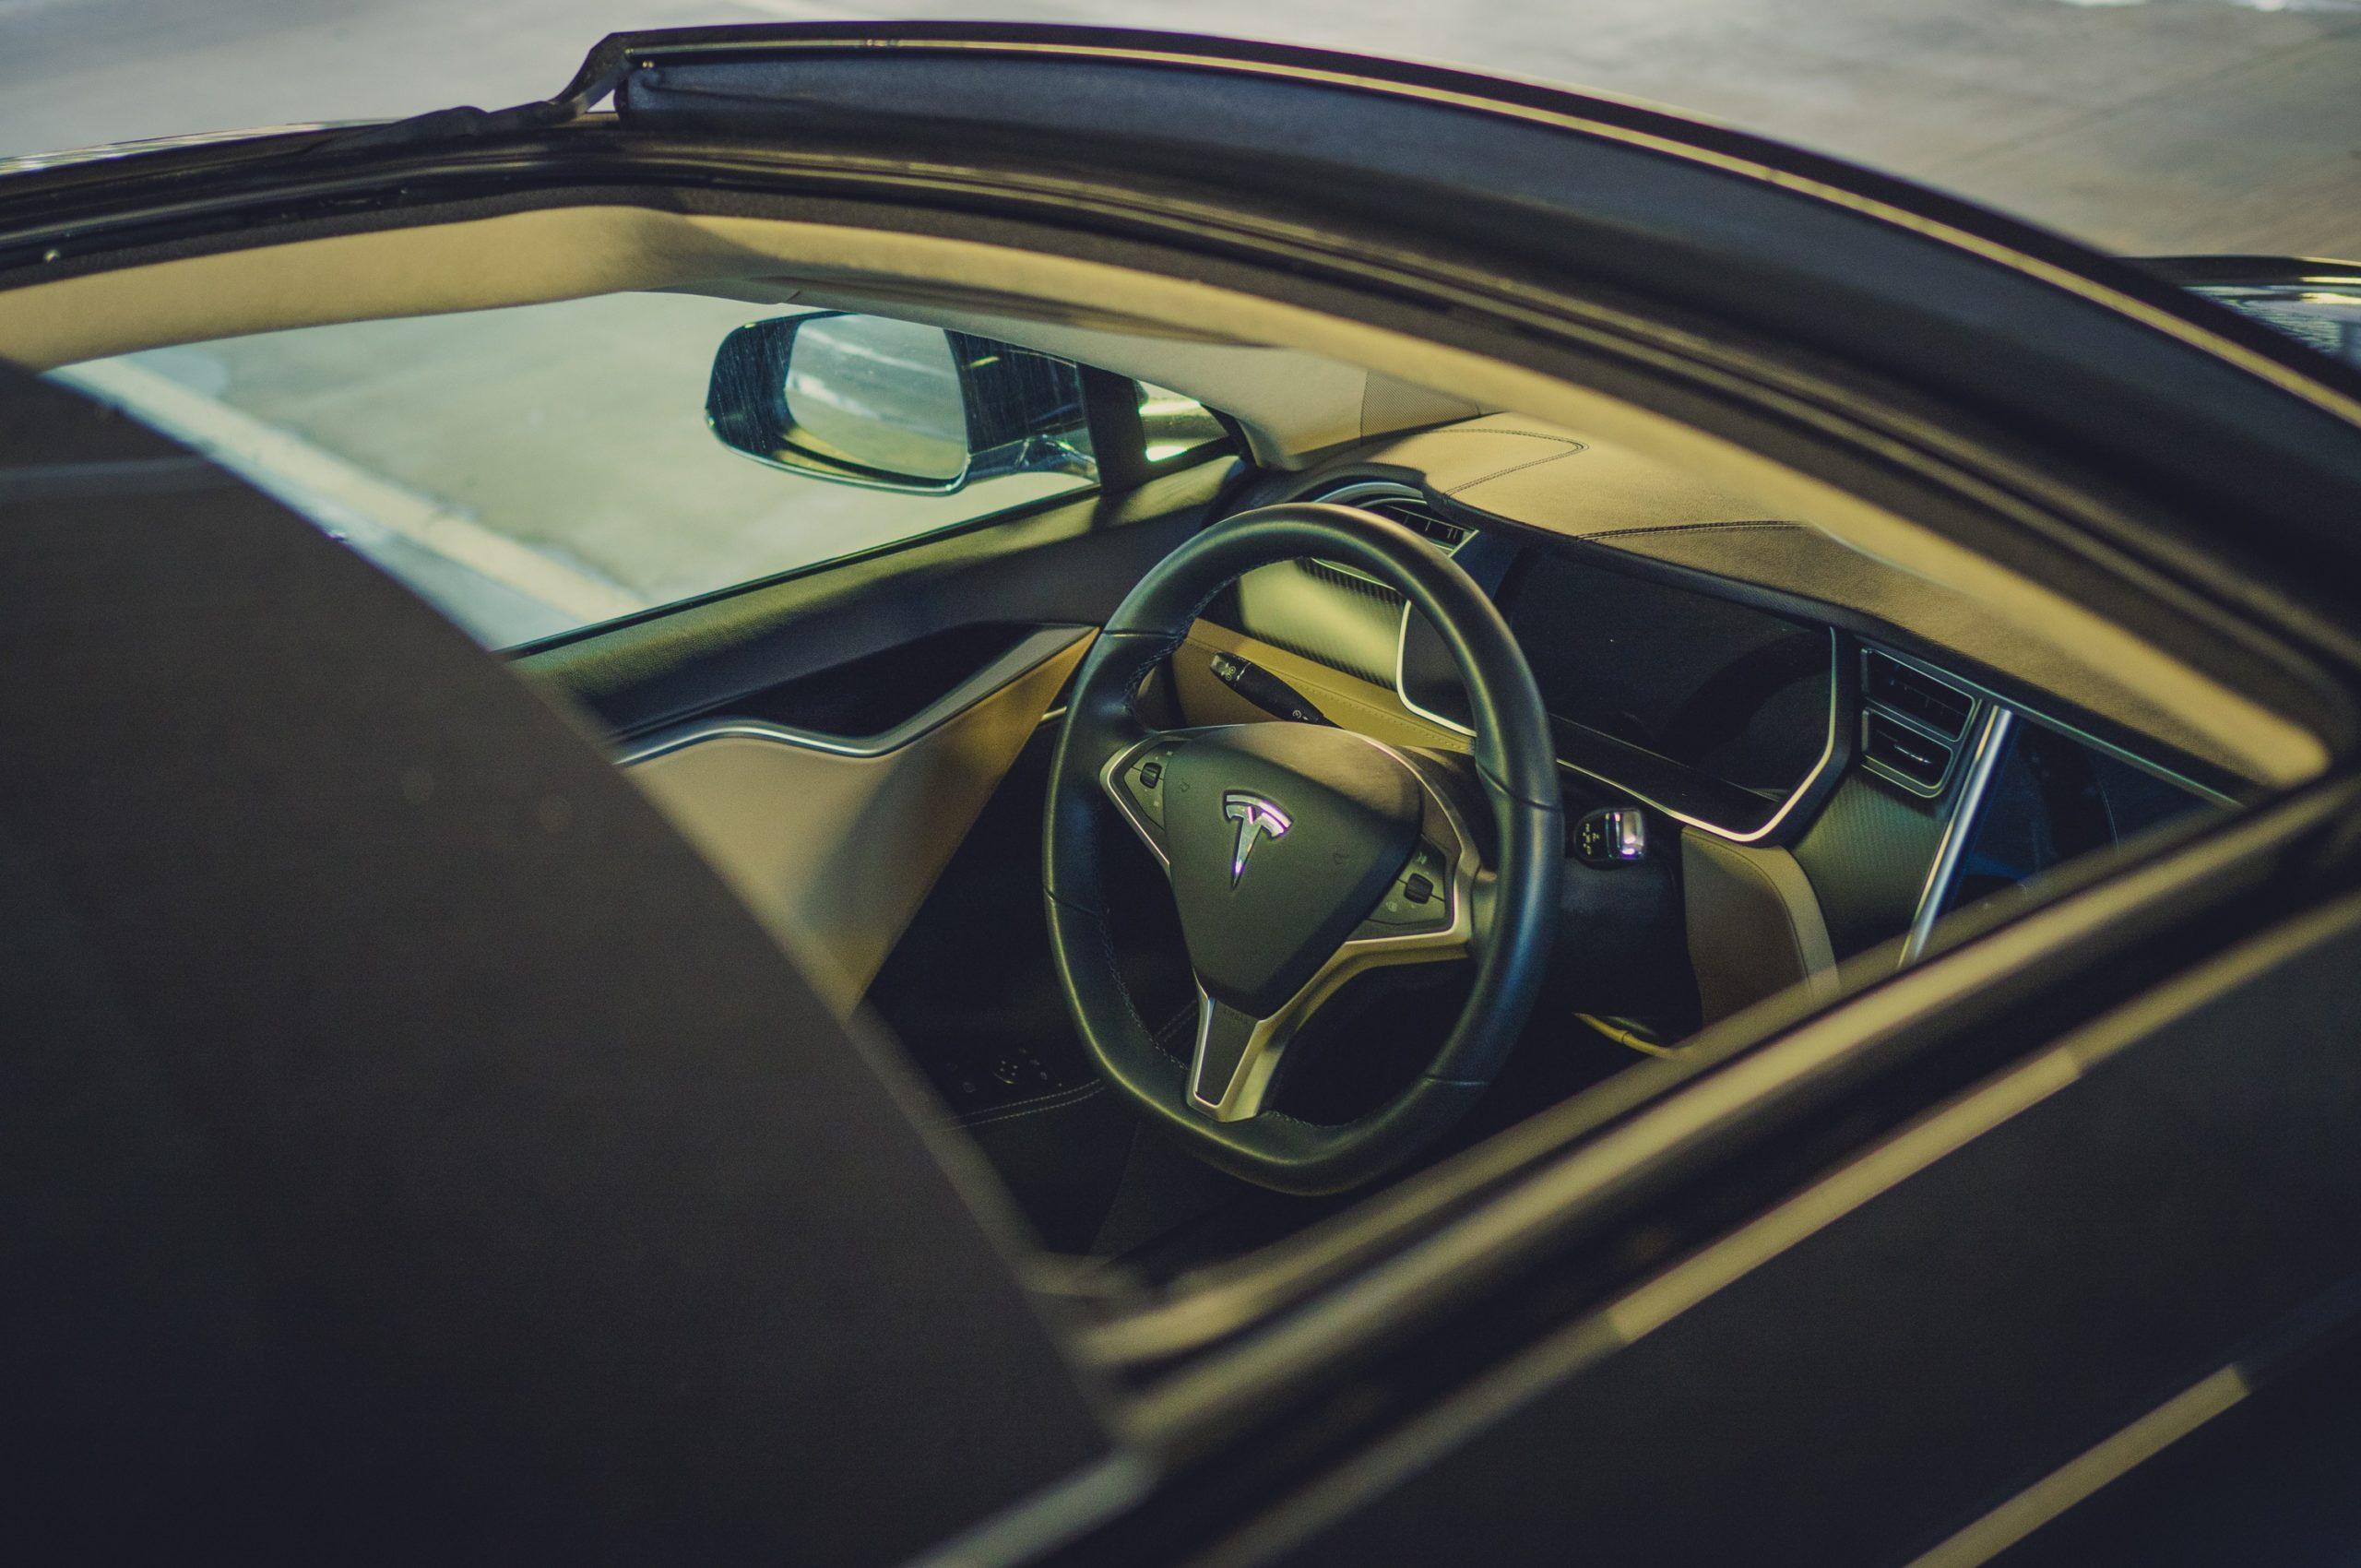 Tesla Model S P85 Schiebedach Panorama sun roof geöffnet Interieur Extras Ausstattung Premium Leder Lenkrad Display Touchscreen blau metallic Aachen Deutschland emobility Elektrofahrzeug E-Auto